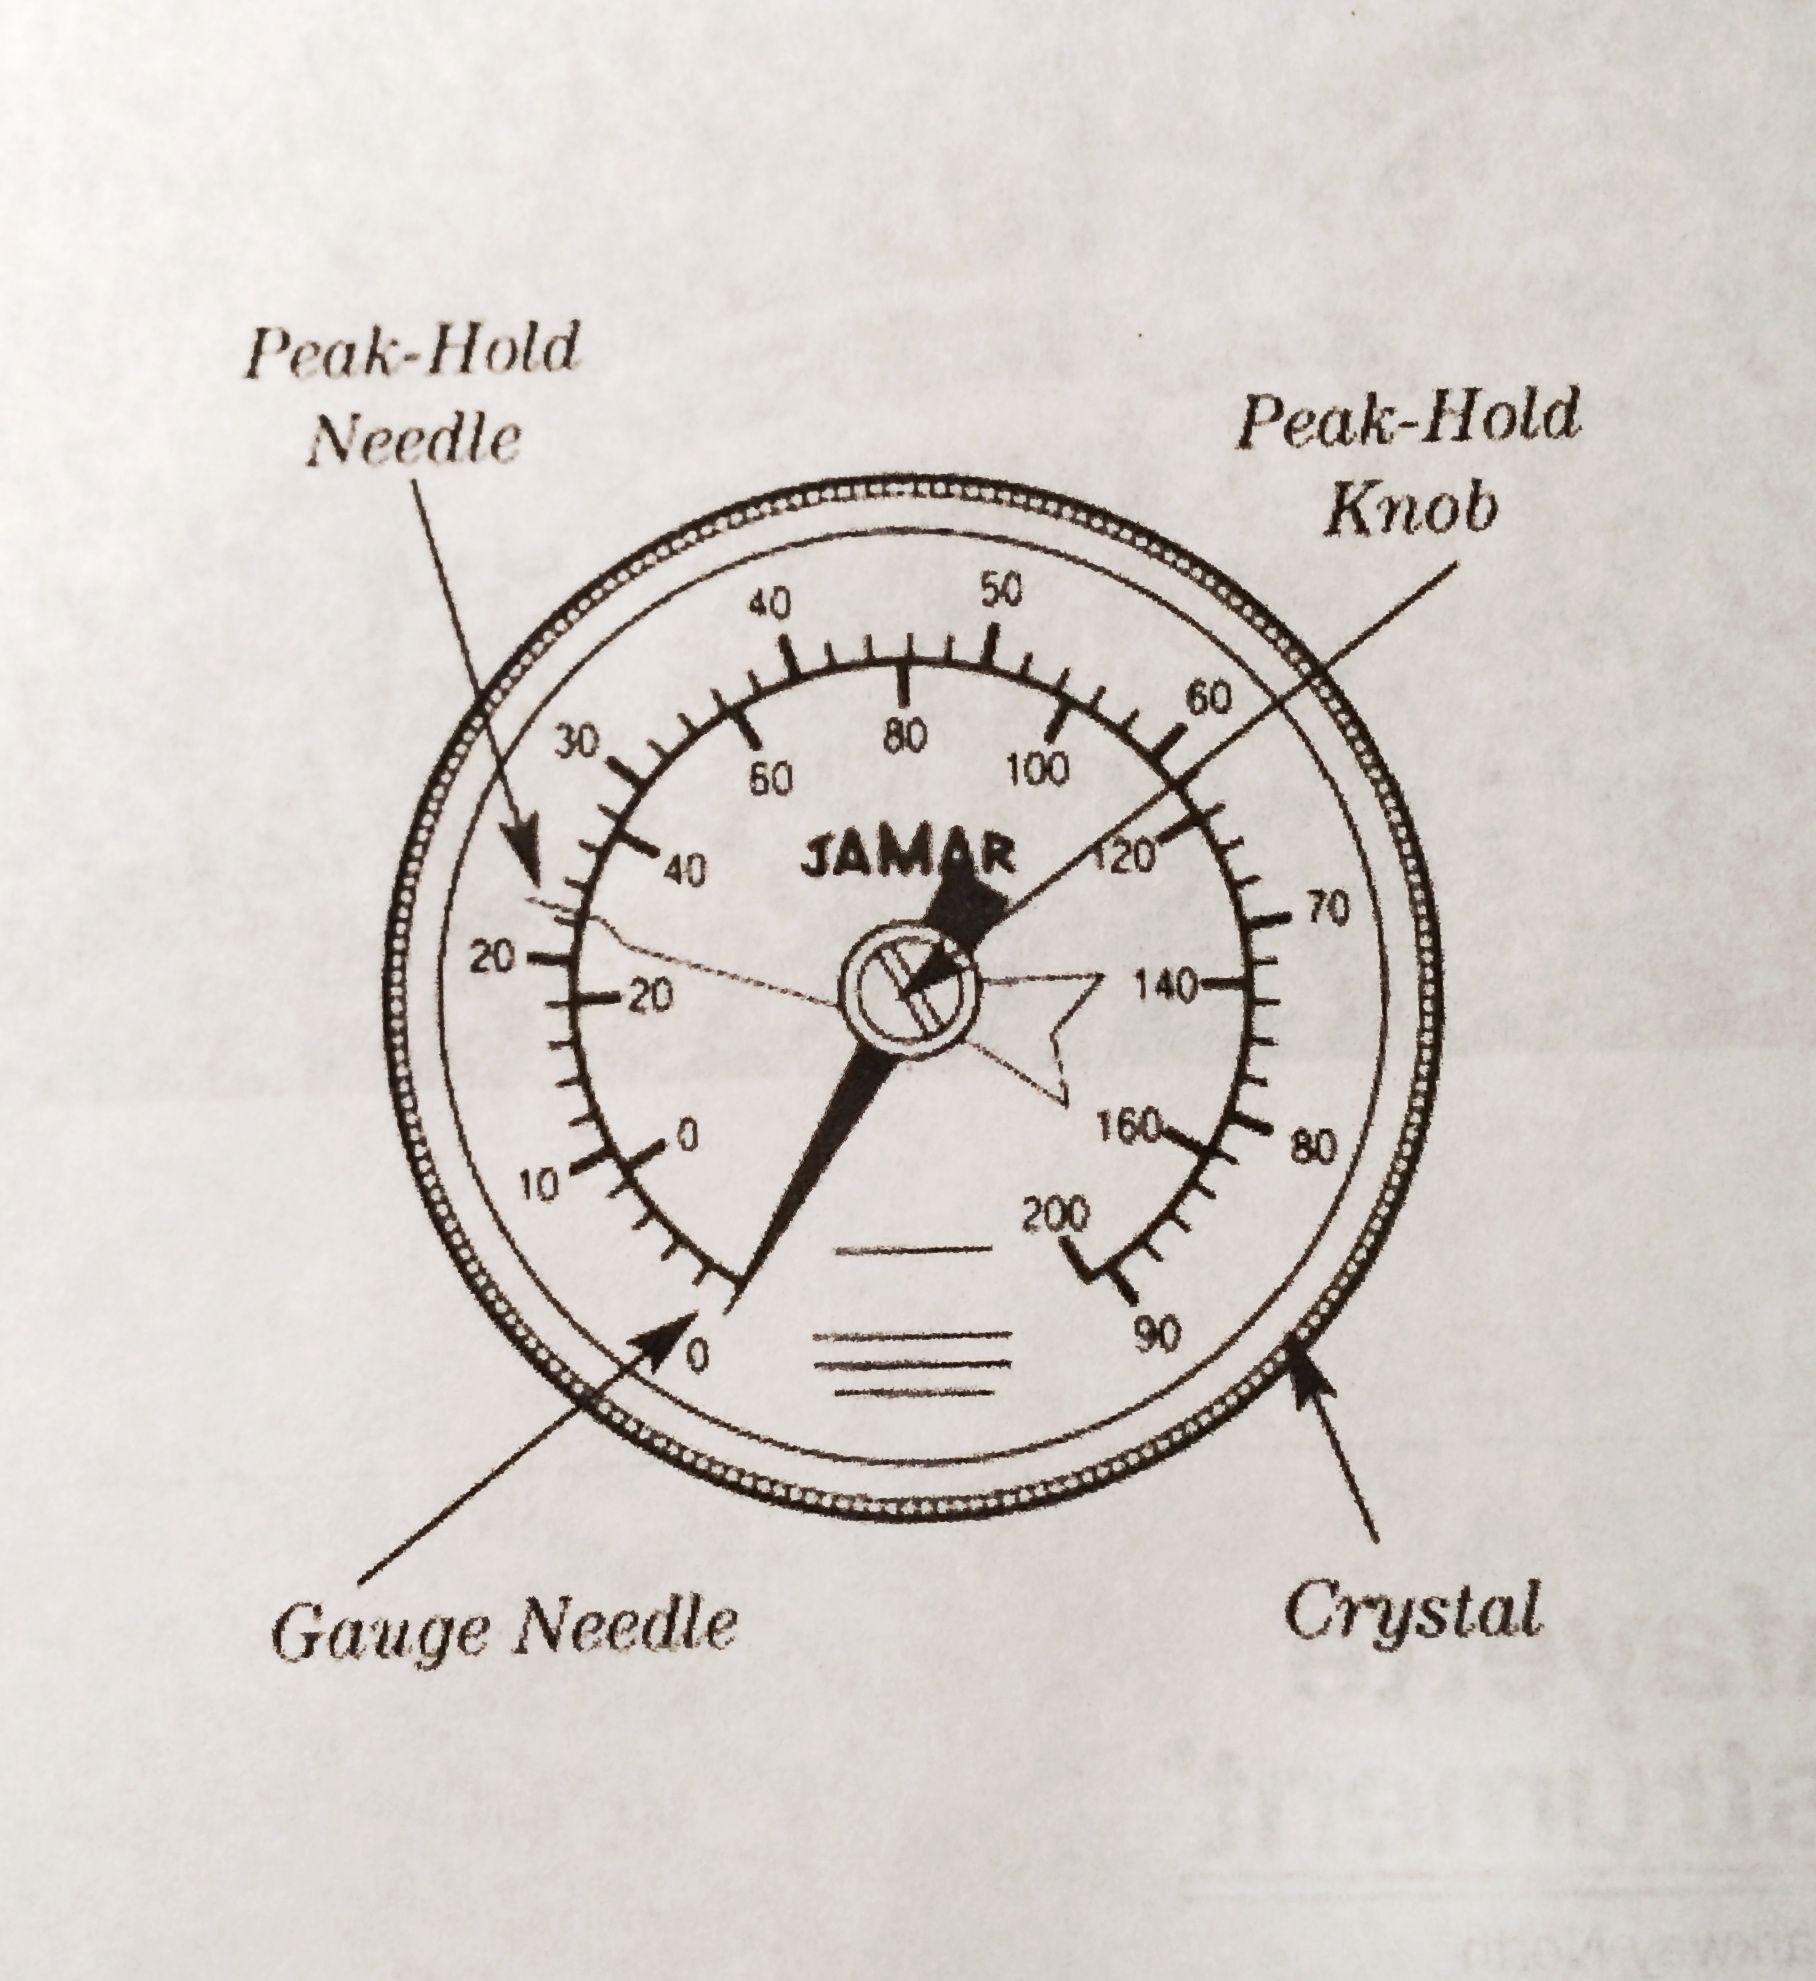 Dynamometer Grip Strength Chart Pounds : Jamar hand dynamometer display dynamometers pinterest